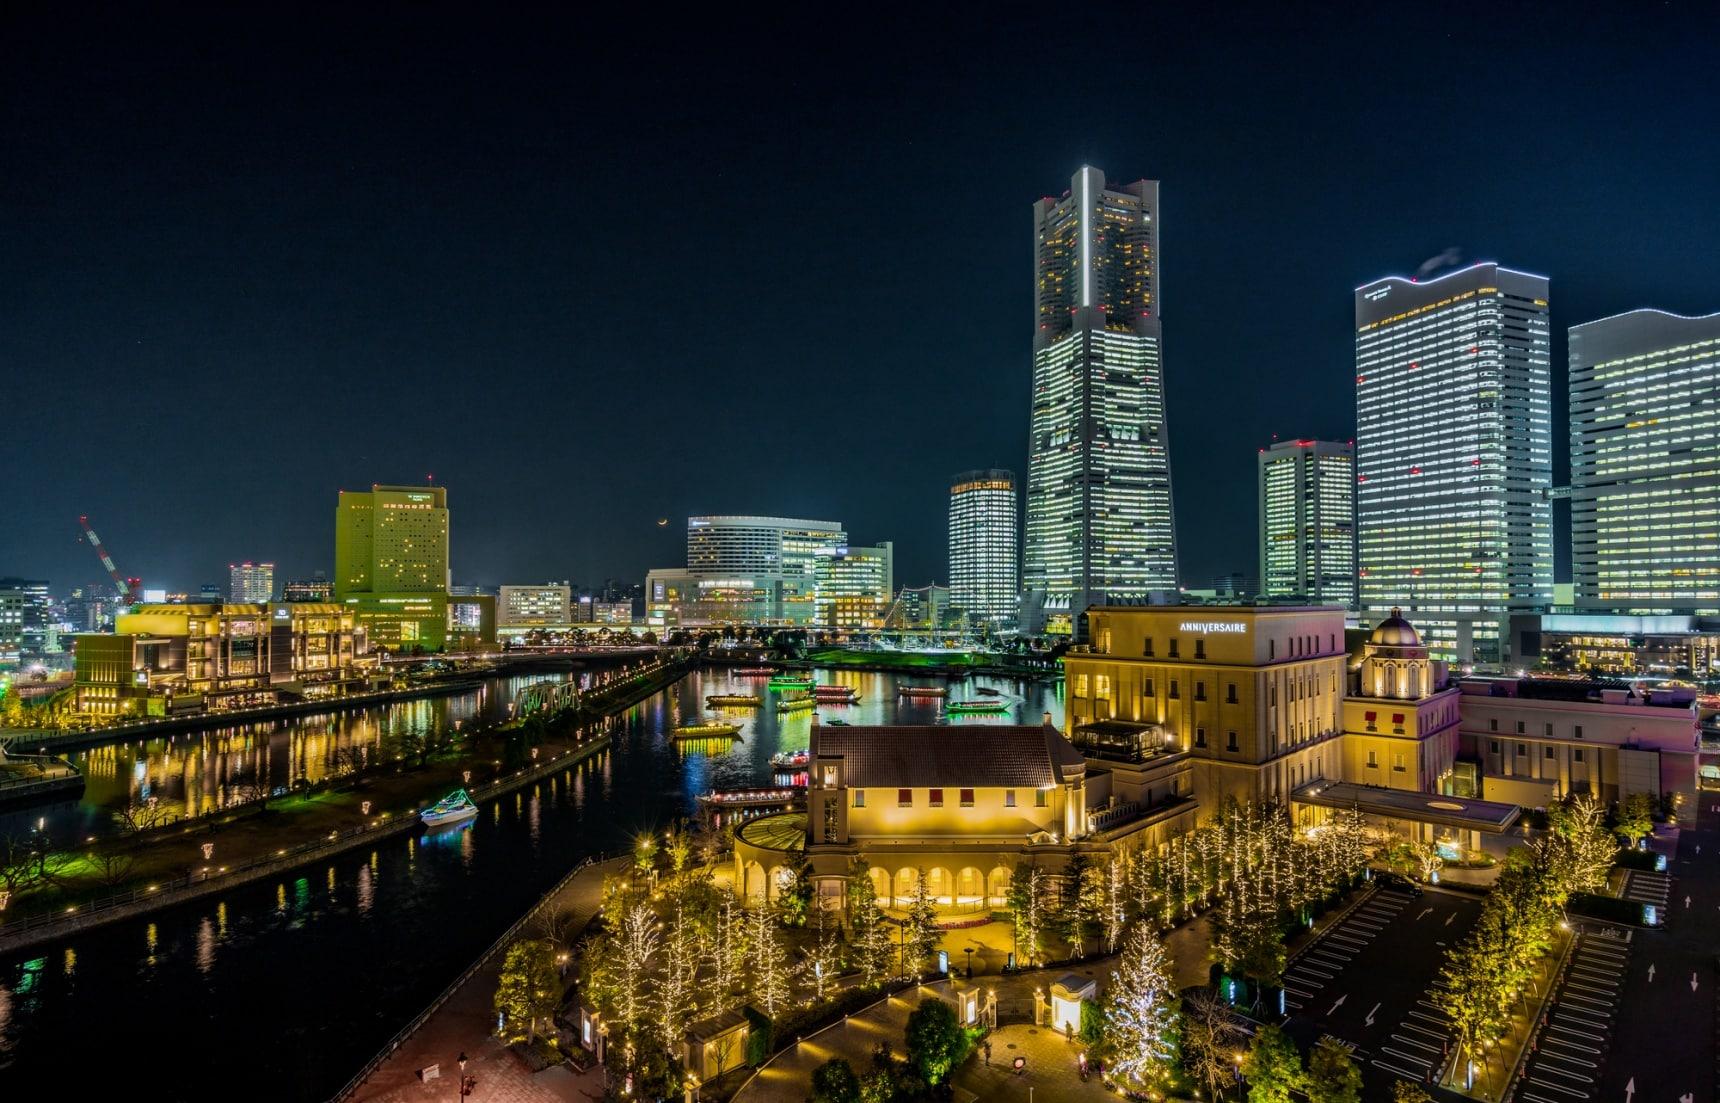 Yokohama: The Most Desirable City in Kanto